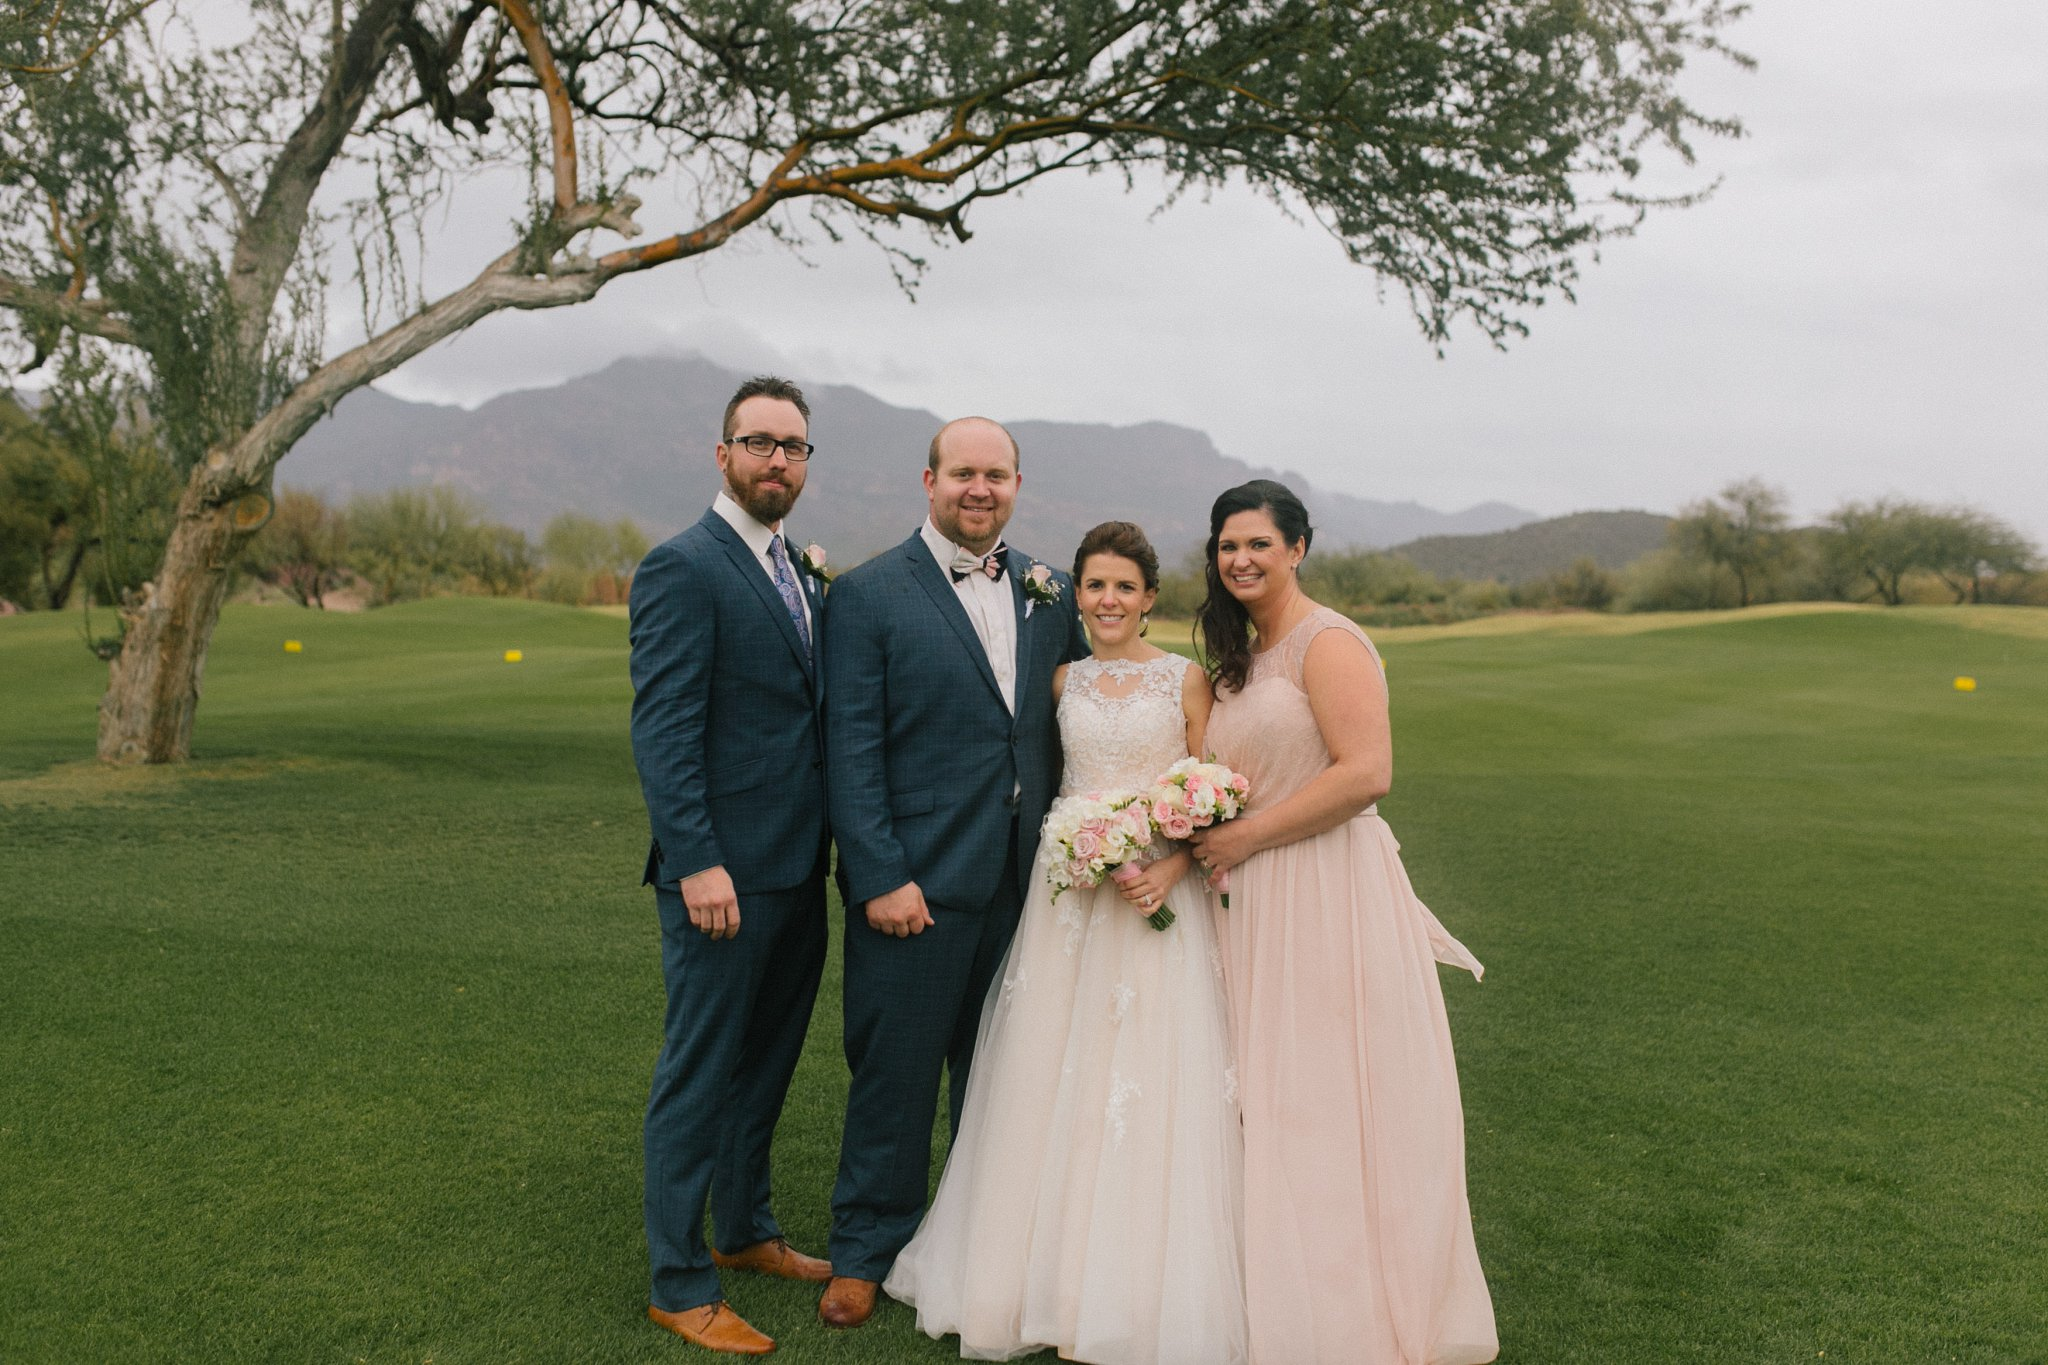 Gold Canyon Golf Resort wedding party